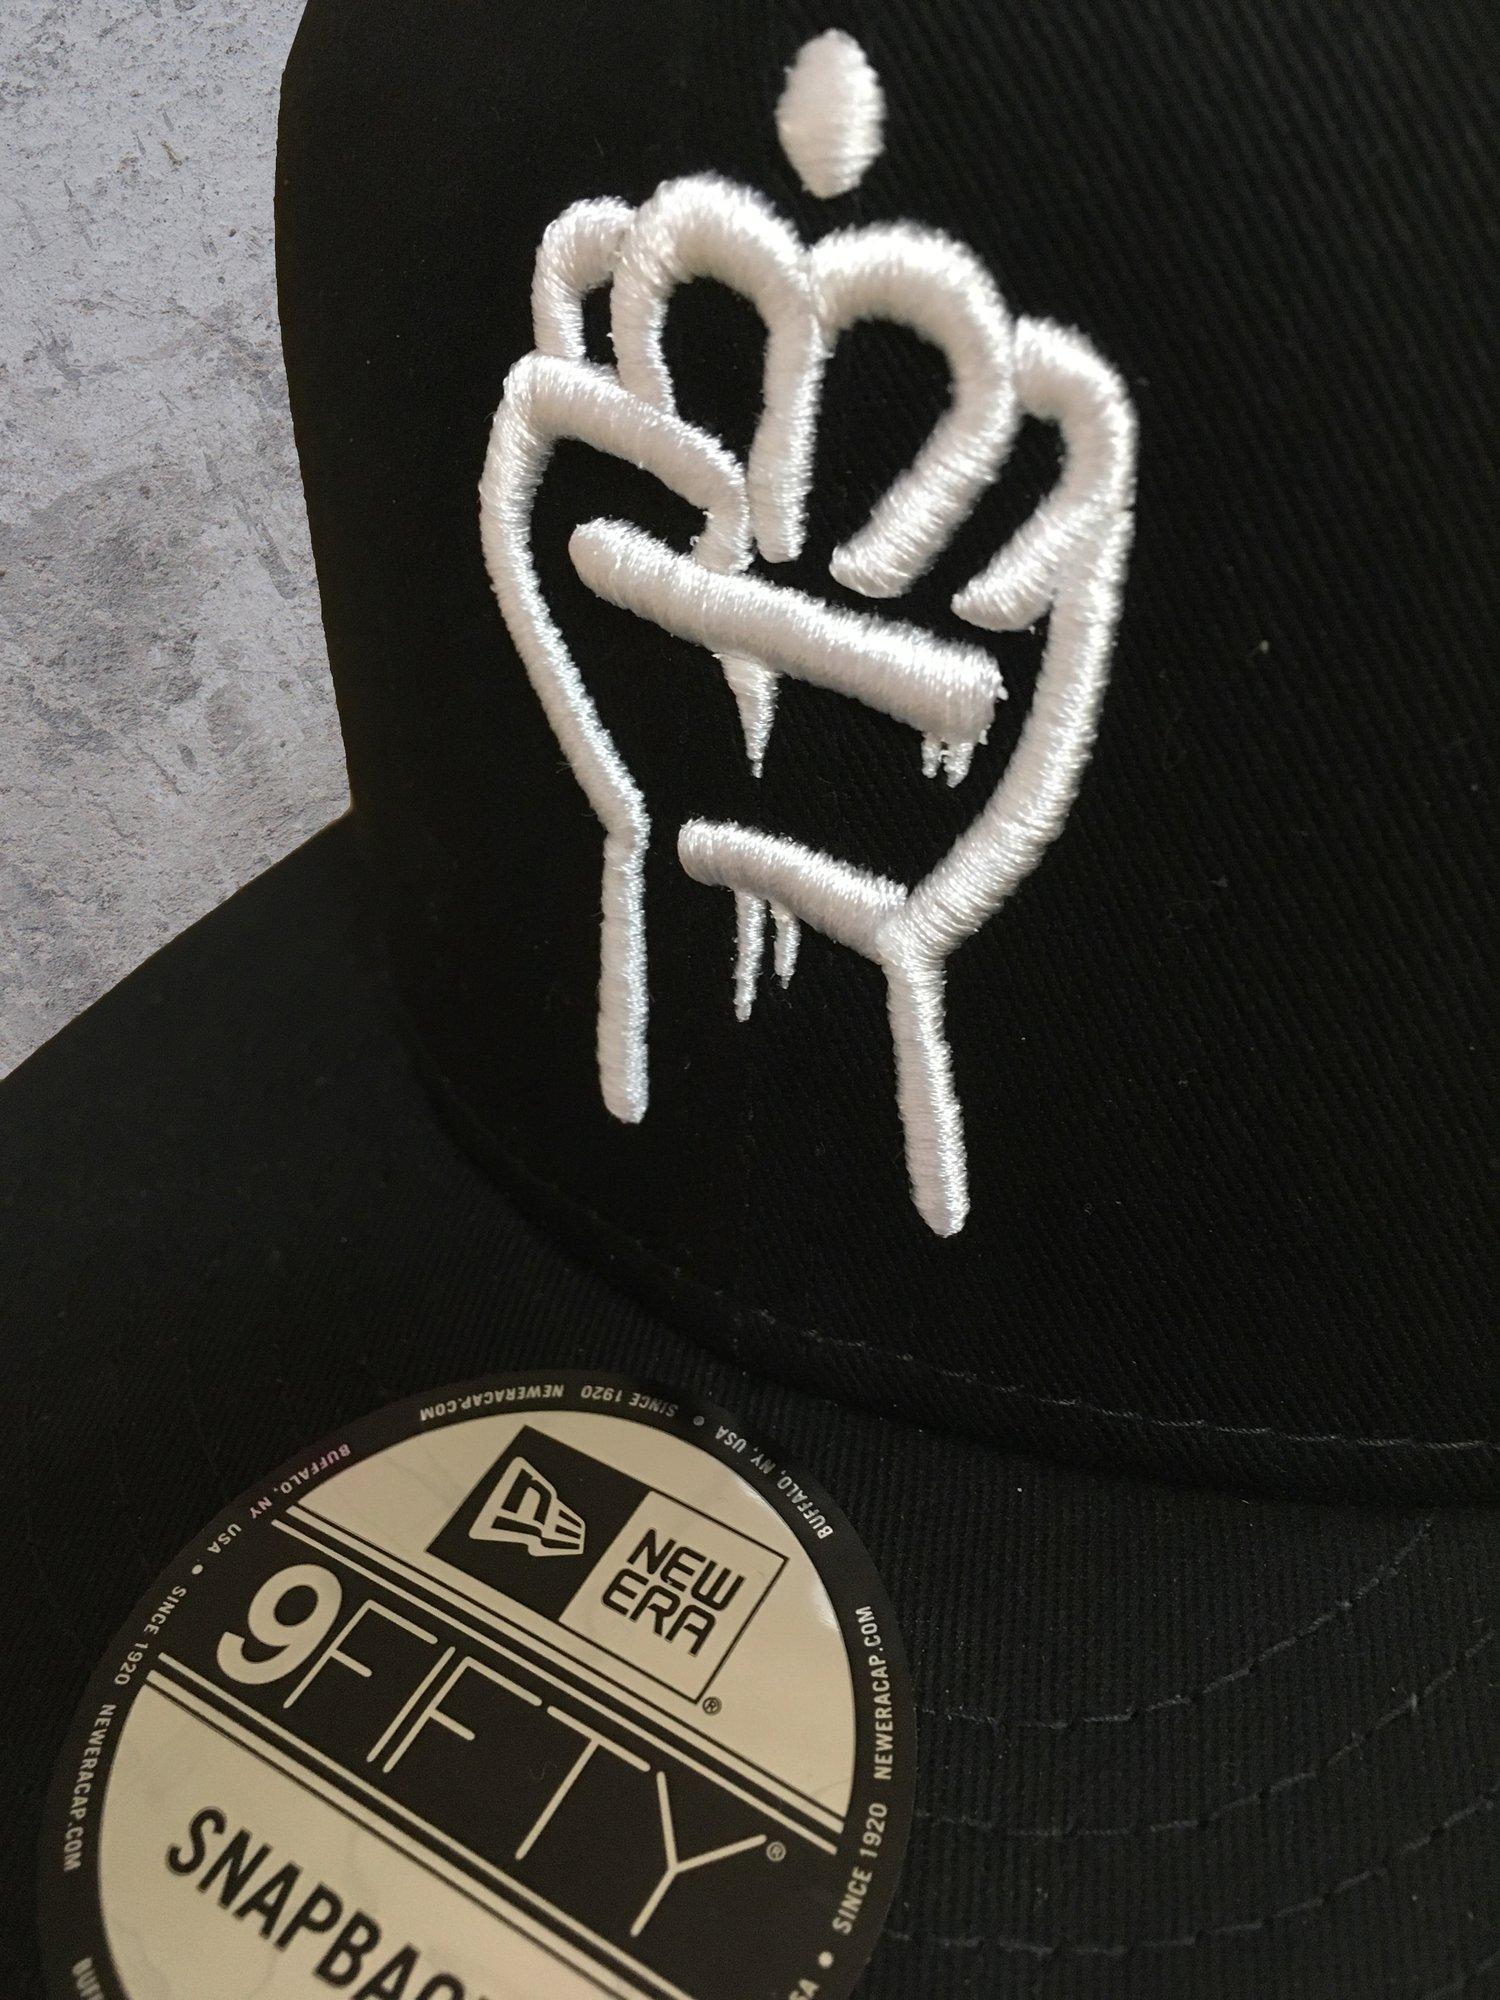 Image of QC Fist New Era Snapback Hat